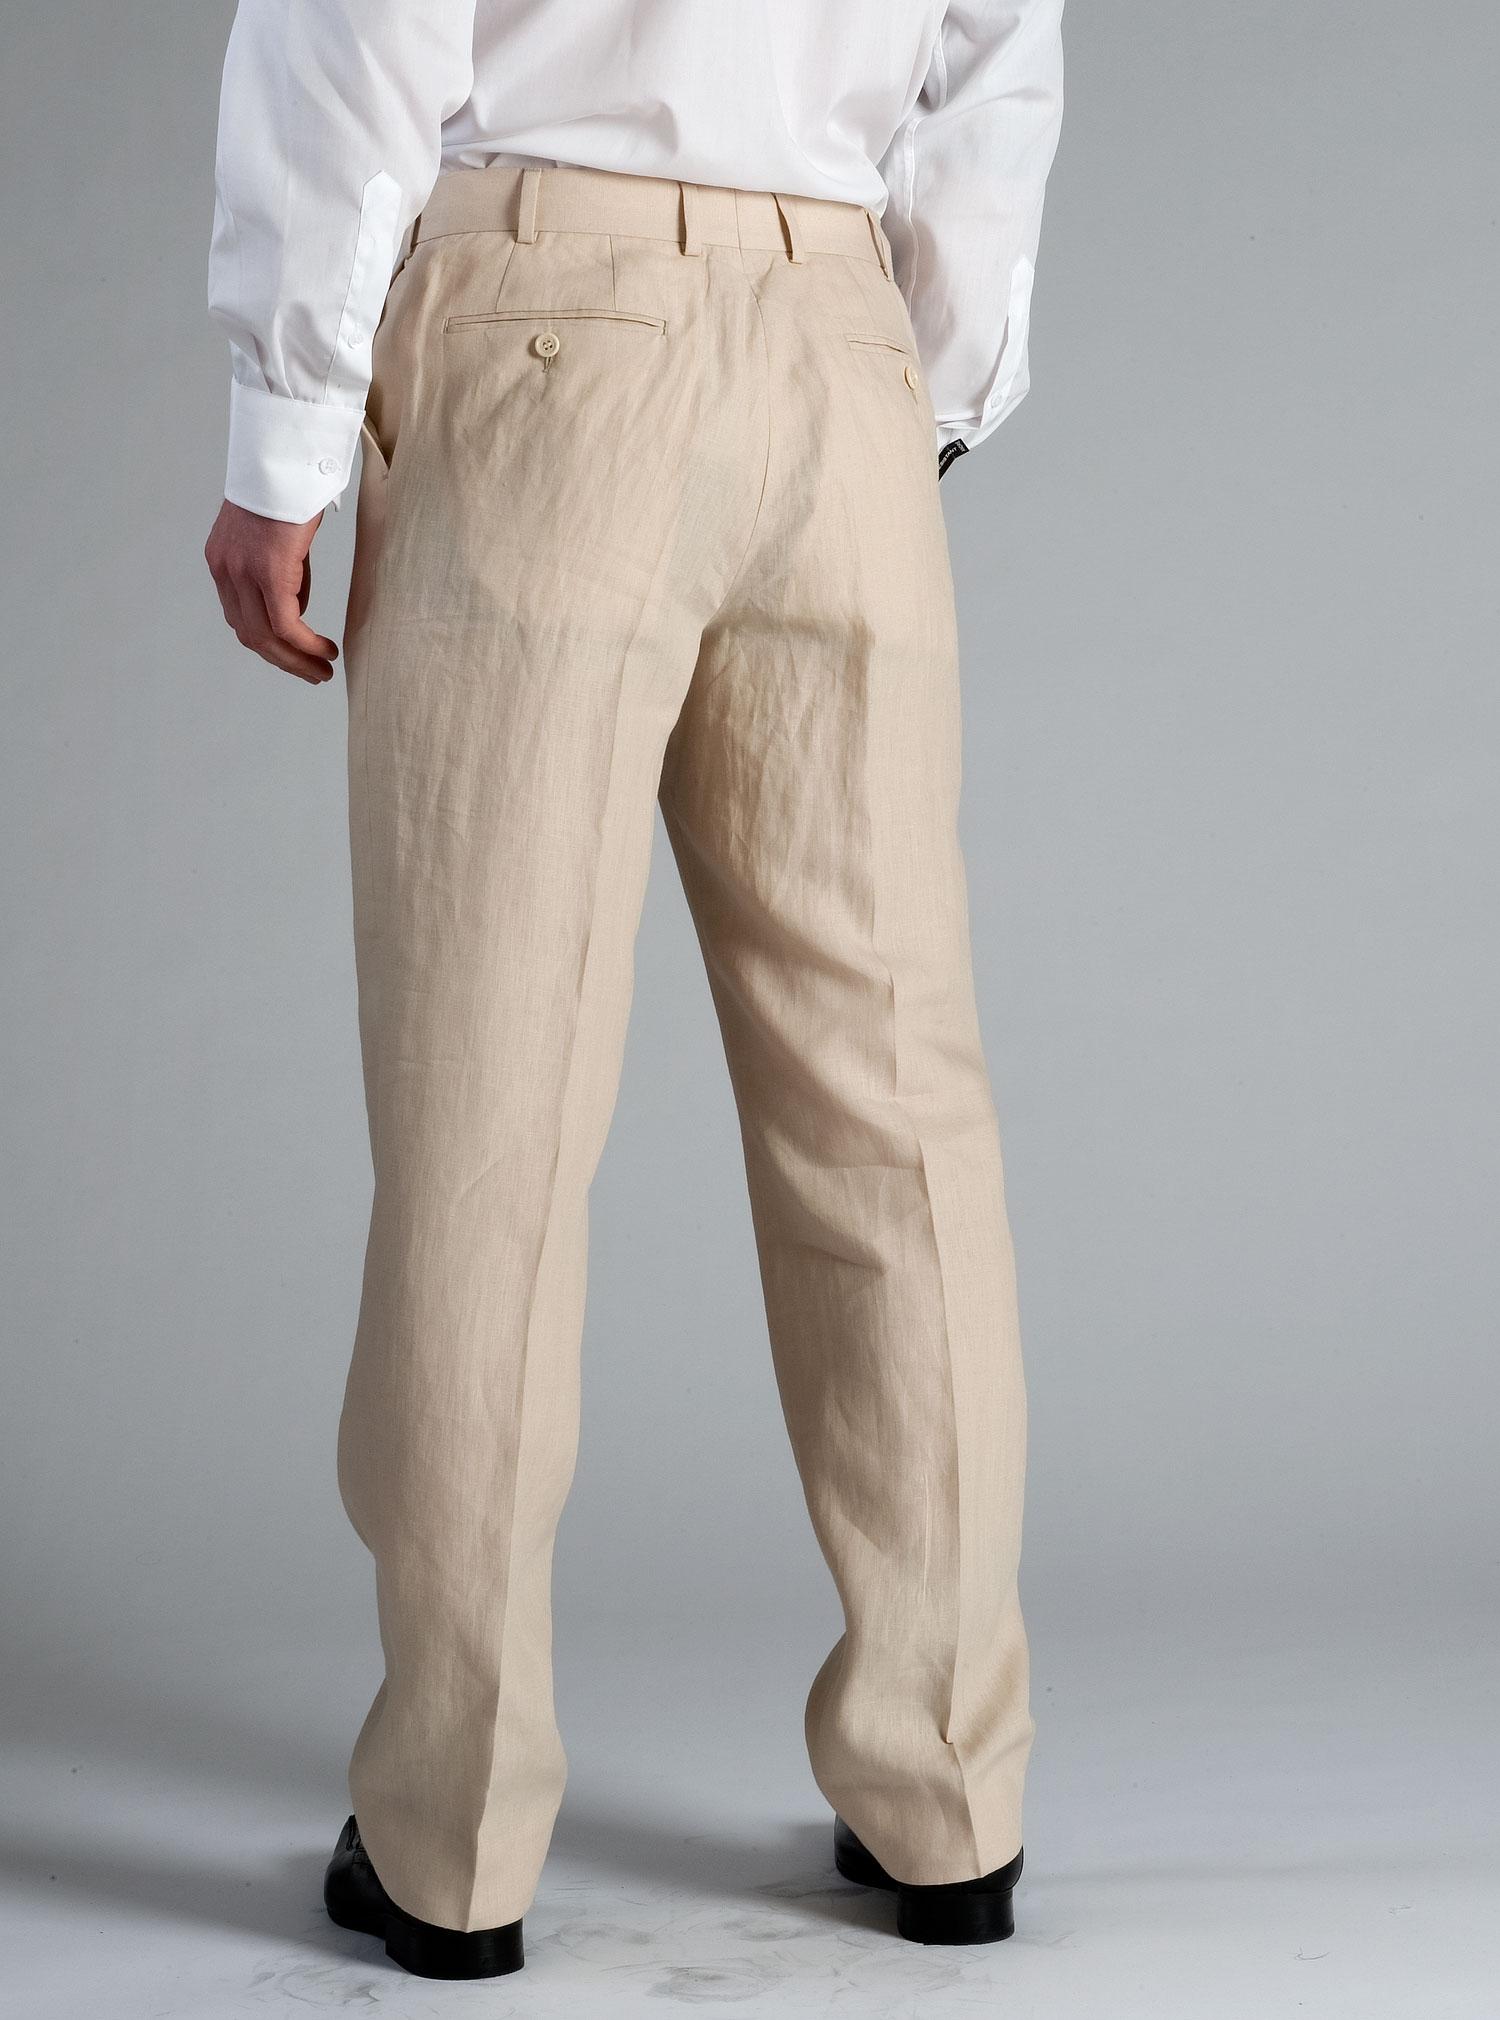 83d2a47e32 Linen Beige Suit - Tom Murphy's Formal and Menswear